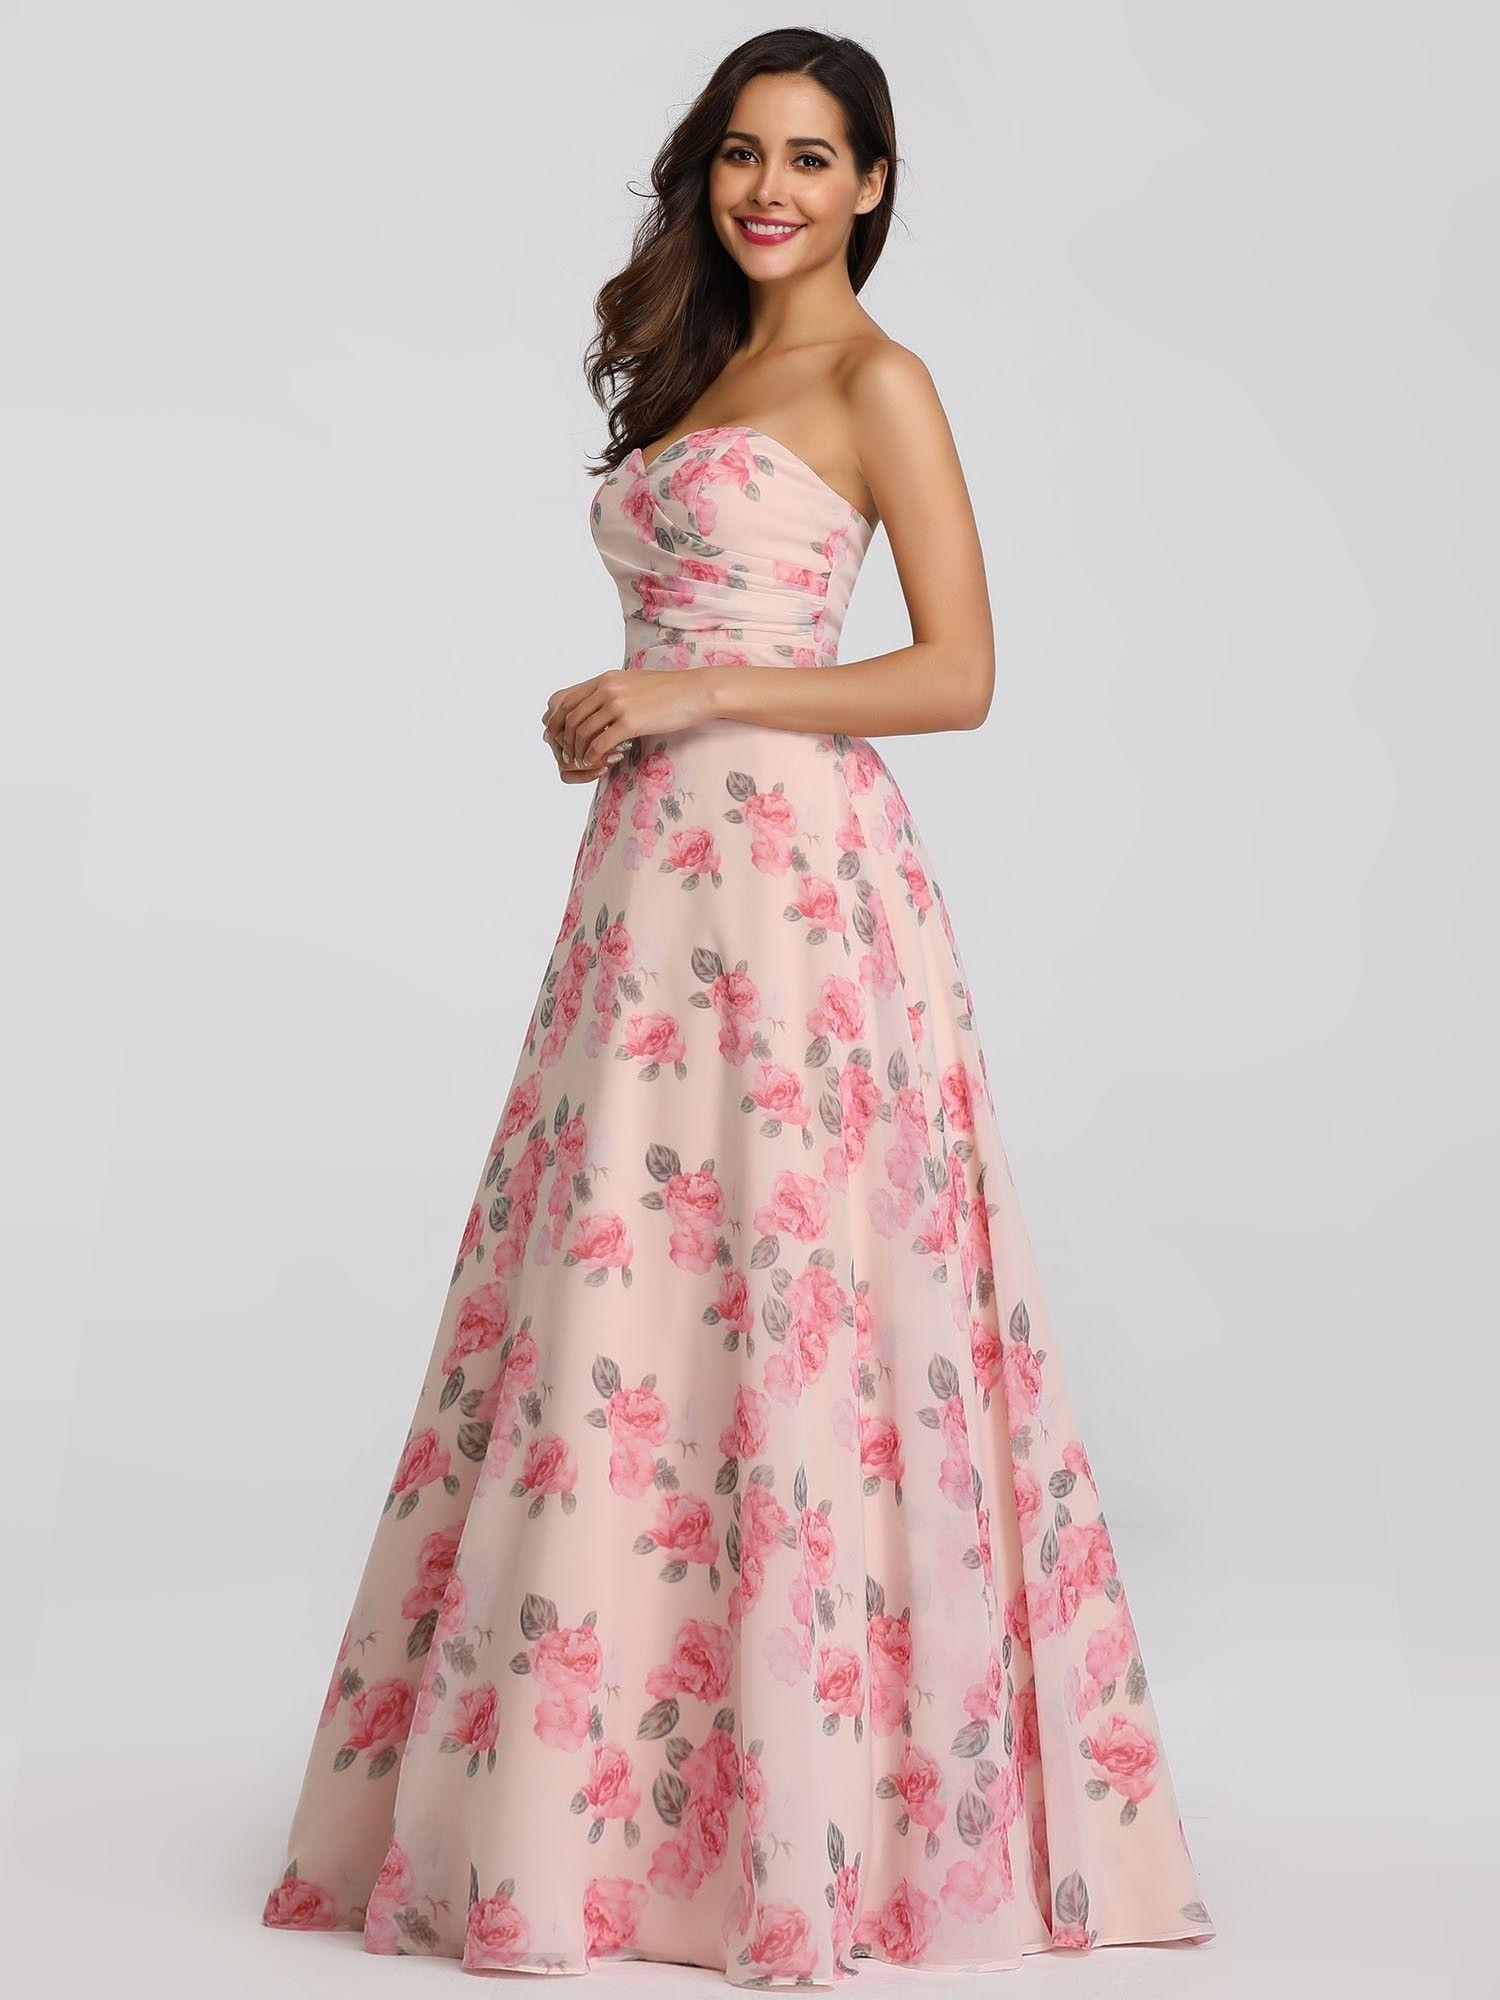 Strapless Long Floral Print Maxi Dress Floral Bridesmaid Dresses Sleeveless Bridesmaid Dresses Long Floral Gown [ 2000 x 1500 Pixel ]